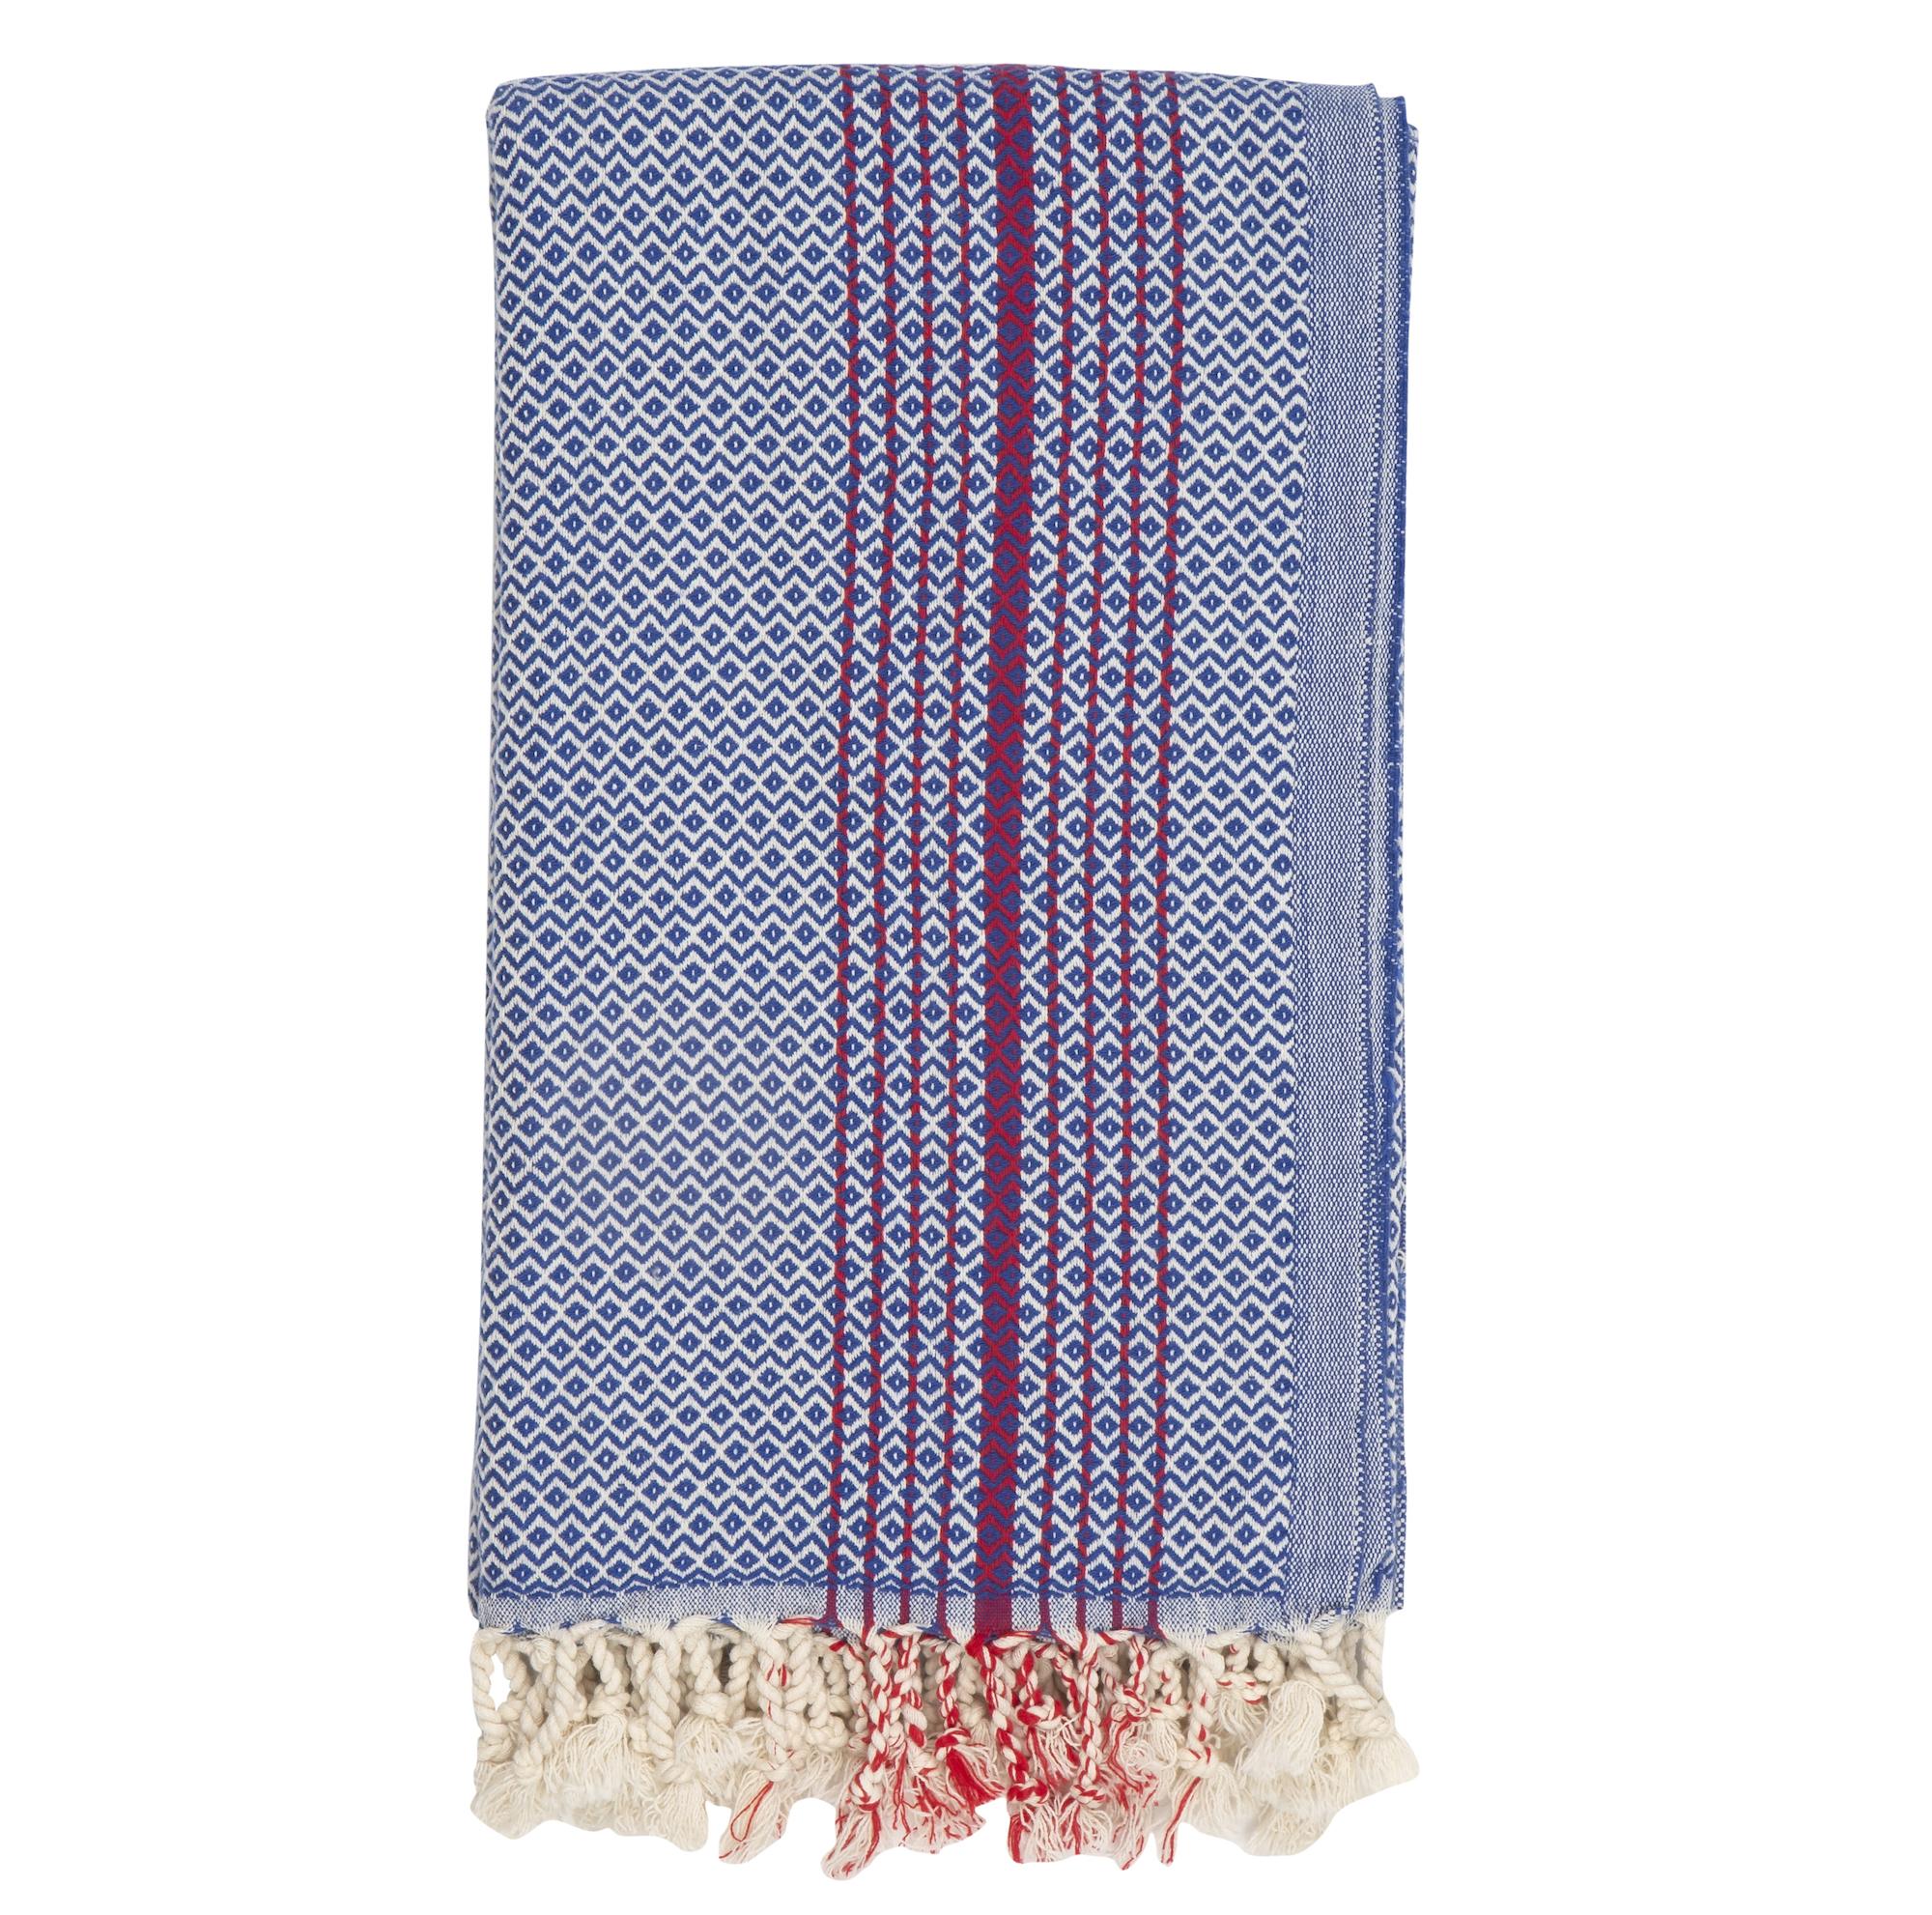 Hammam Towel in Dark Blue with Red Stripes